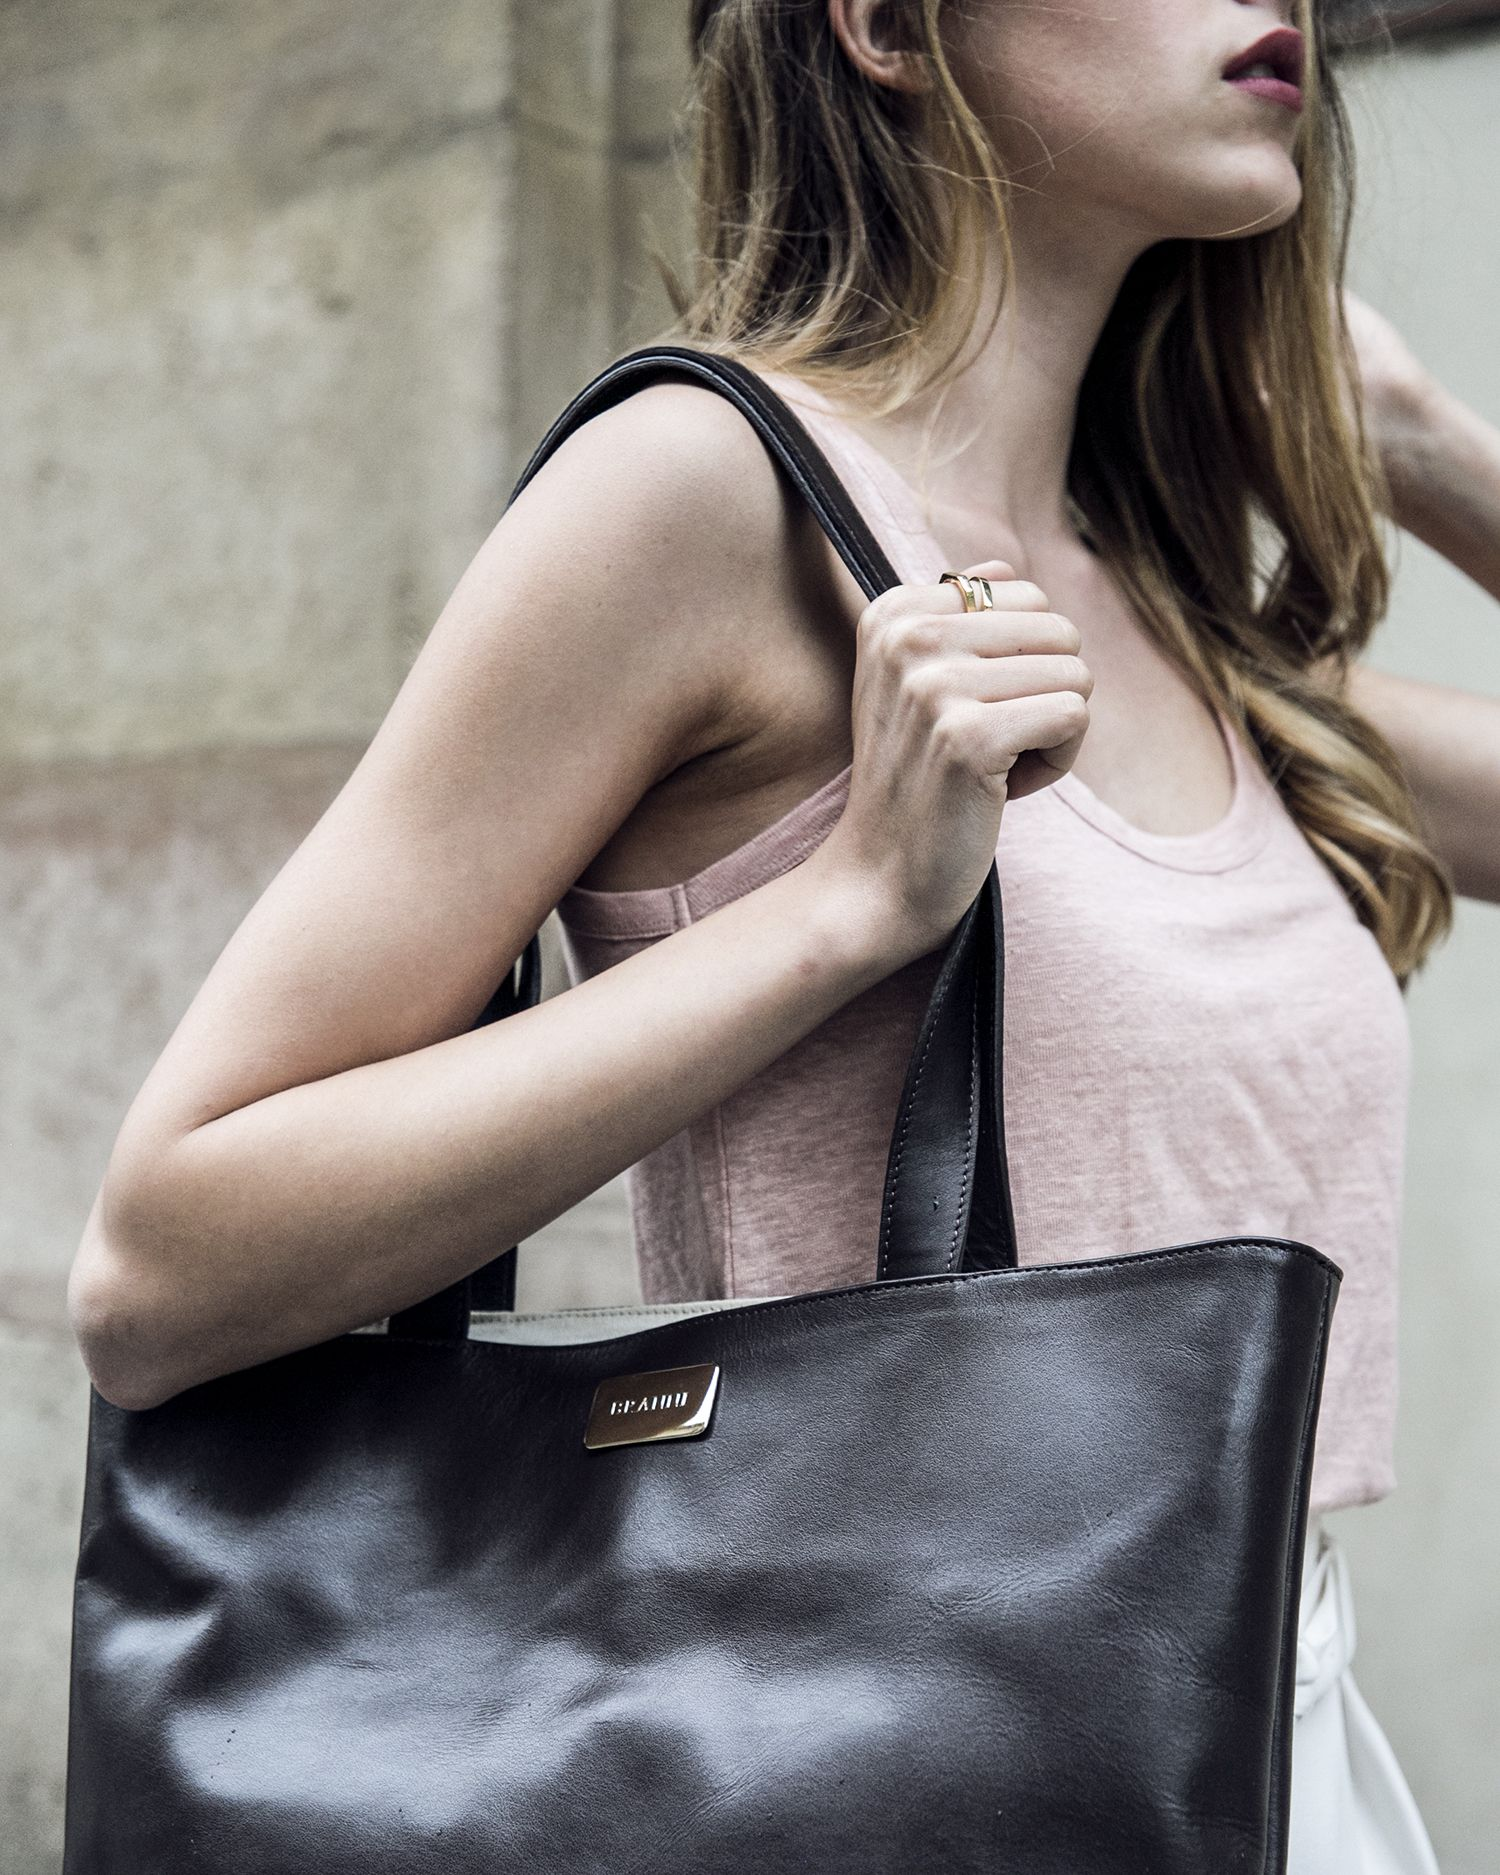 Leather BrownBranni Branni's In Bag Tote Bags 2019 Emma TFl1c3KJ